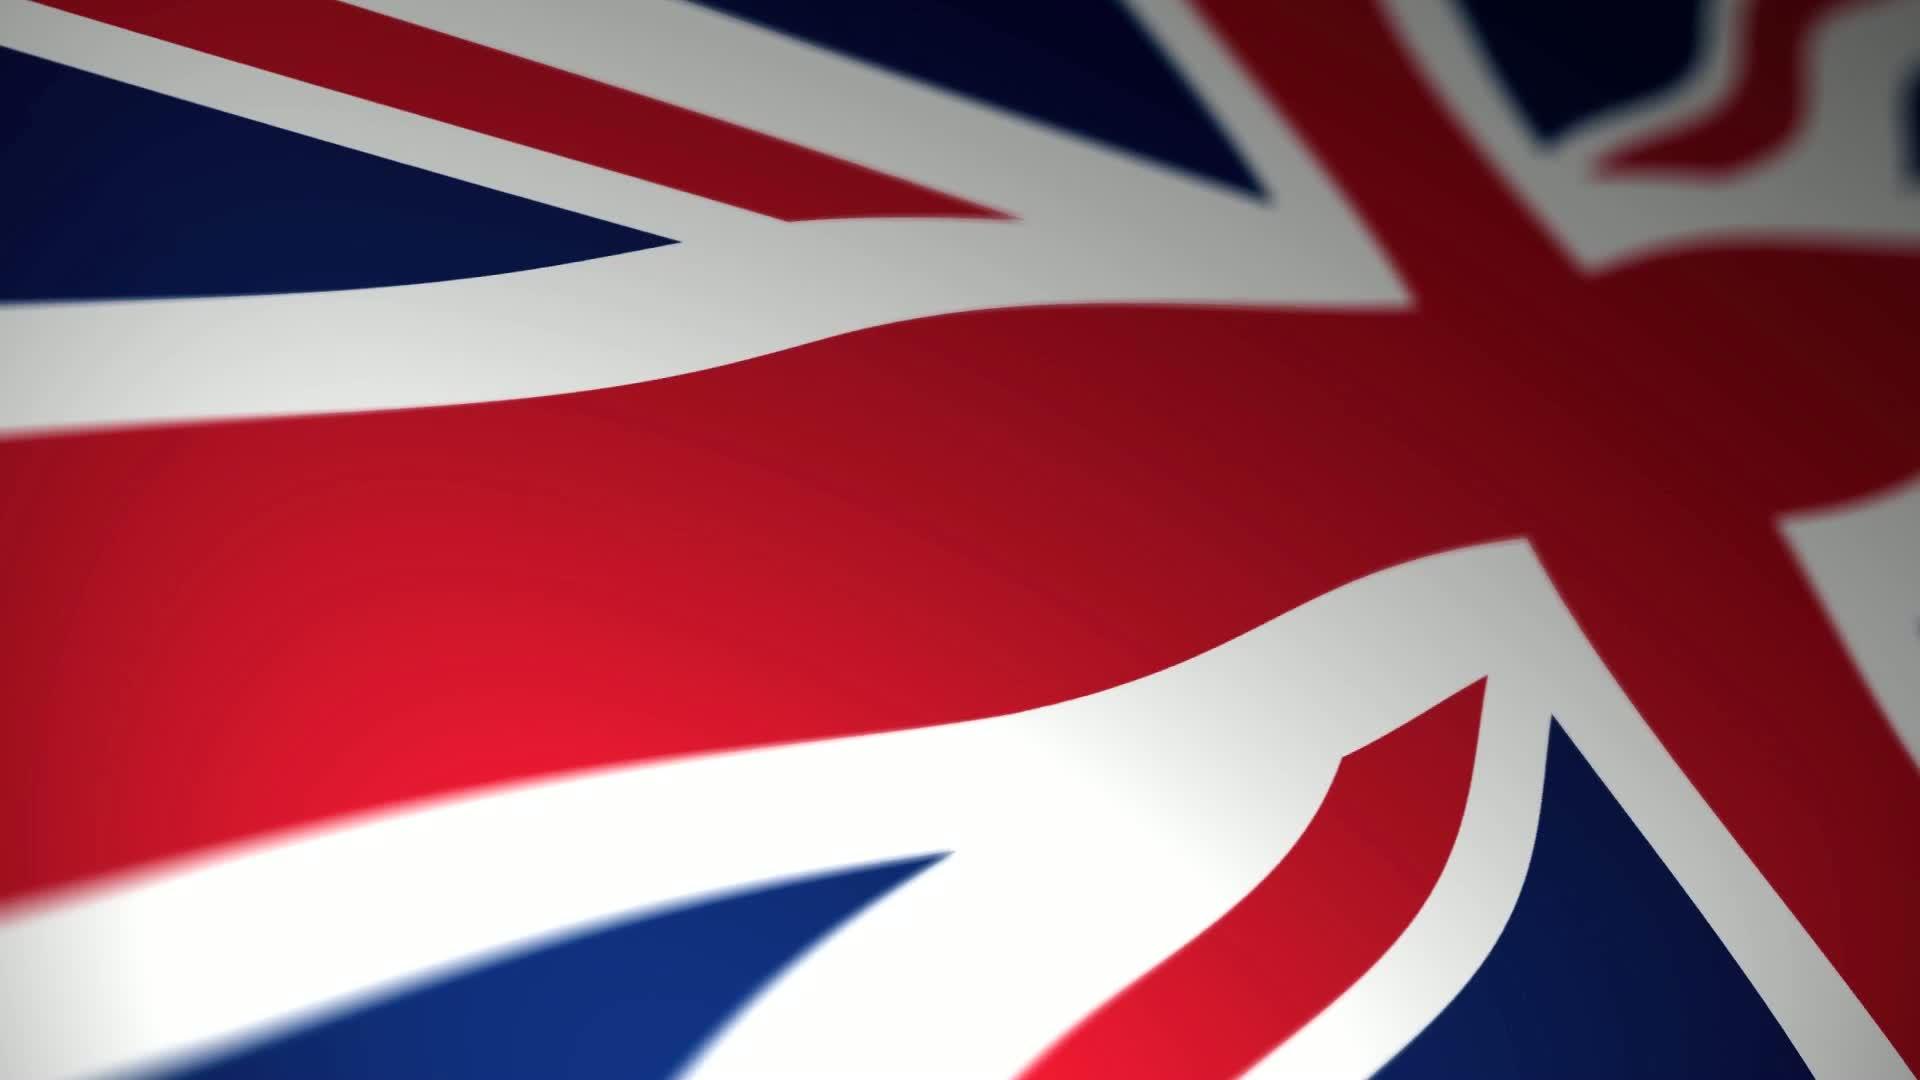 UK Flag Wallpapers 1920x1080